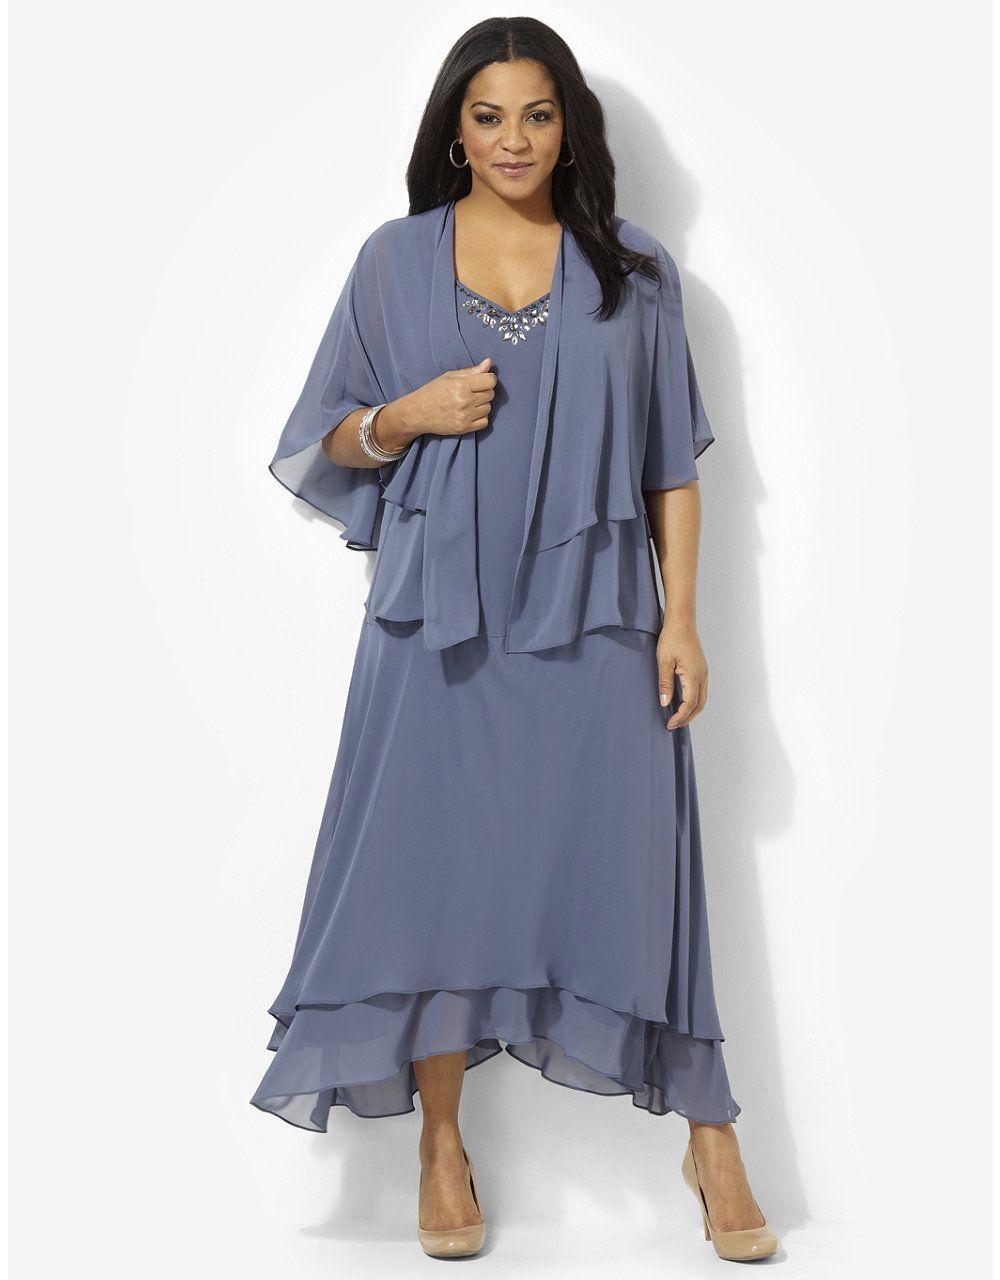 05ecc461e32 Exquisite Jacket Dress